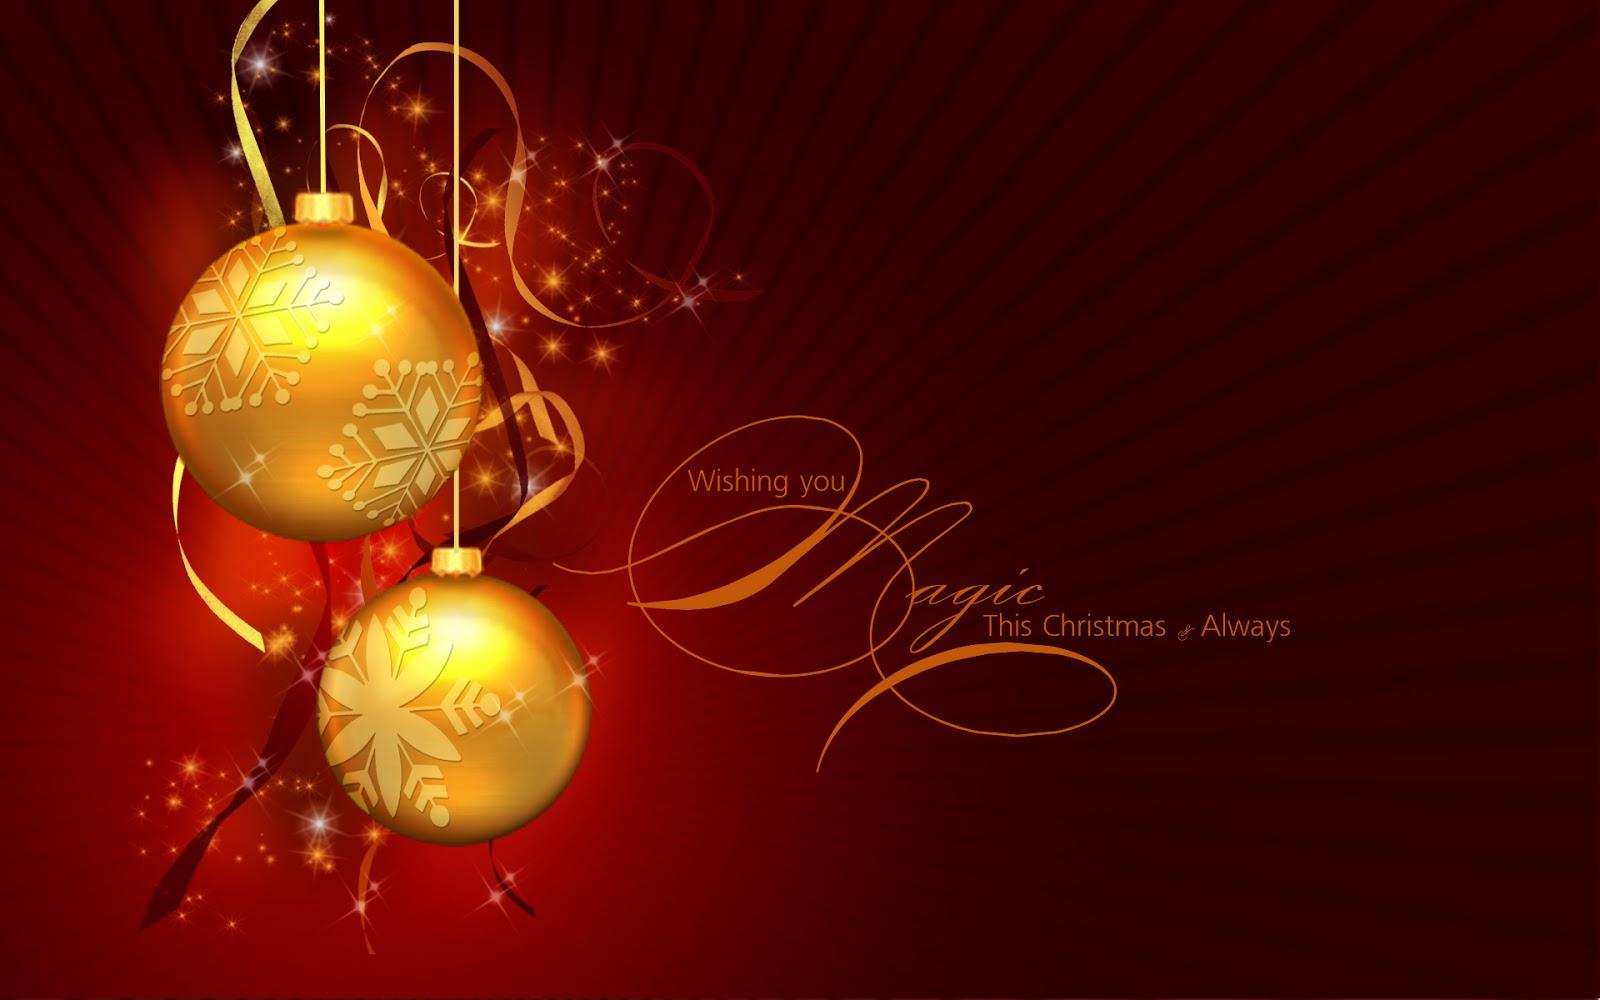 Foto DP BBM Lucu Selamat Natal Merry Christmas Terbaru 2015